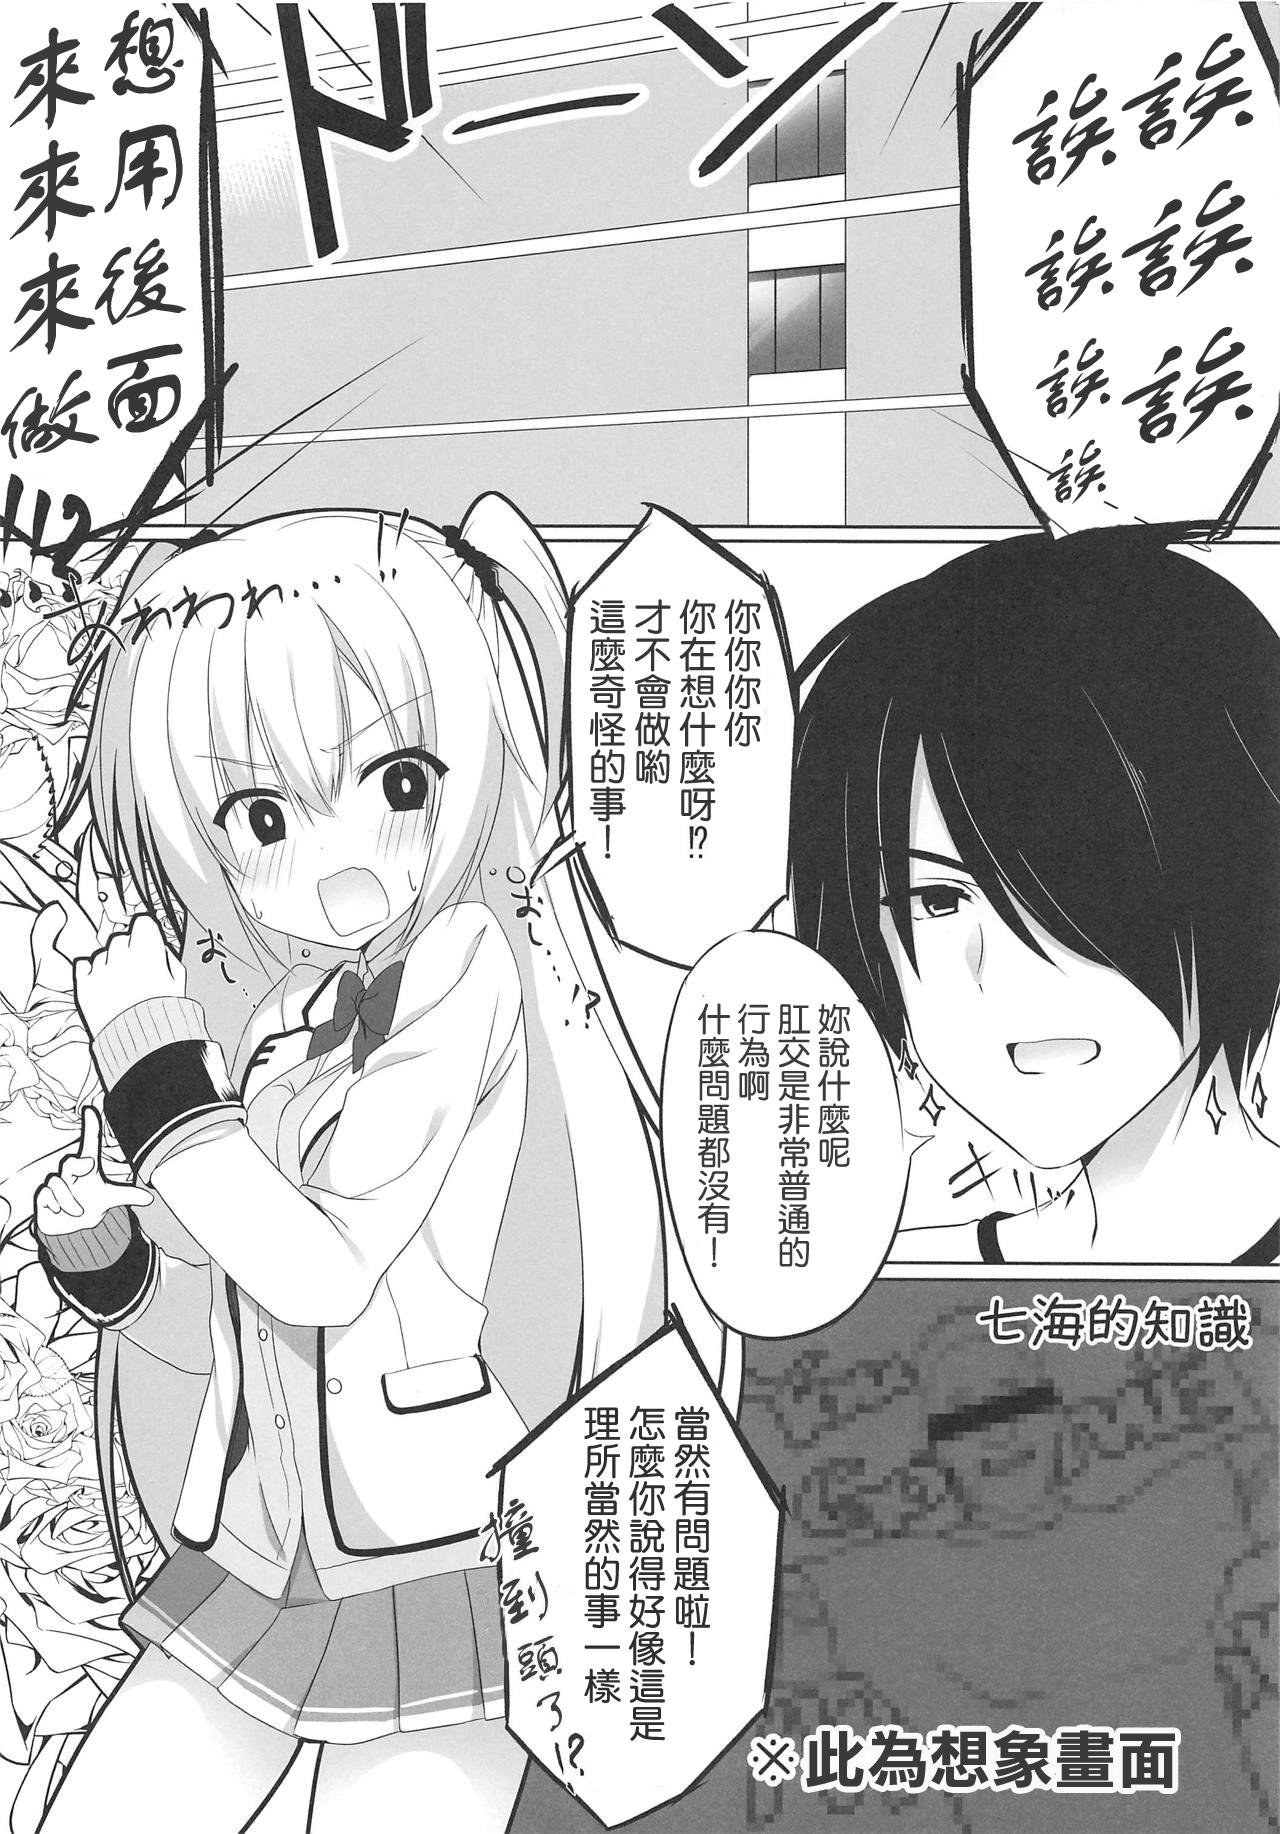 Onii-chan ni Asstral! | 與曉君後勤訓練!! 3